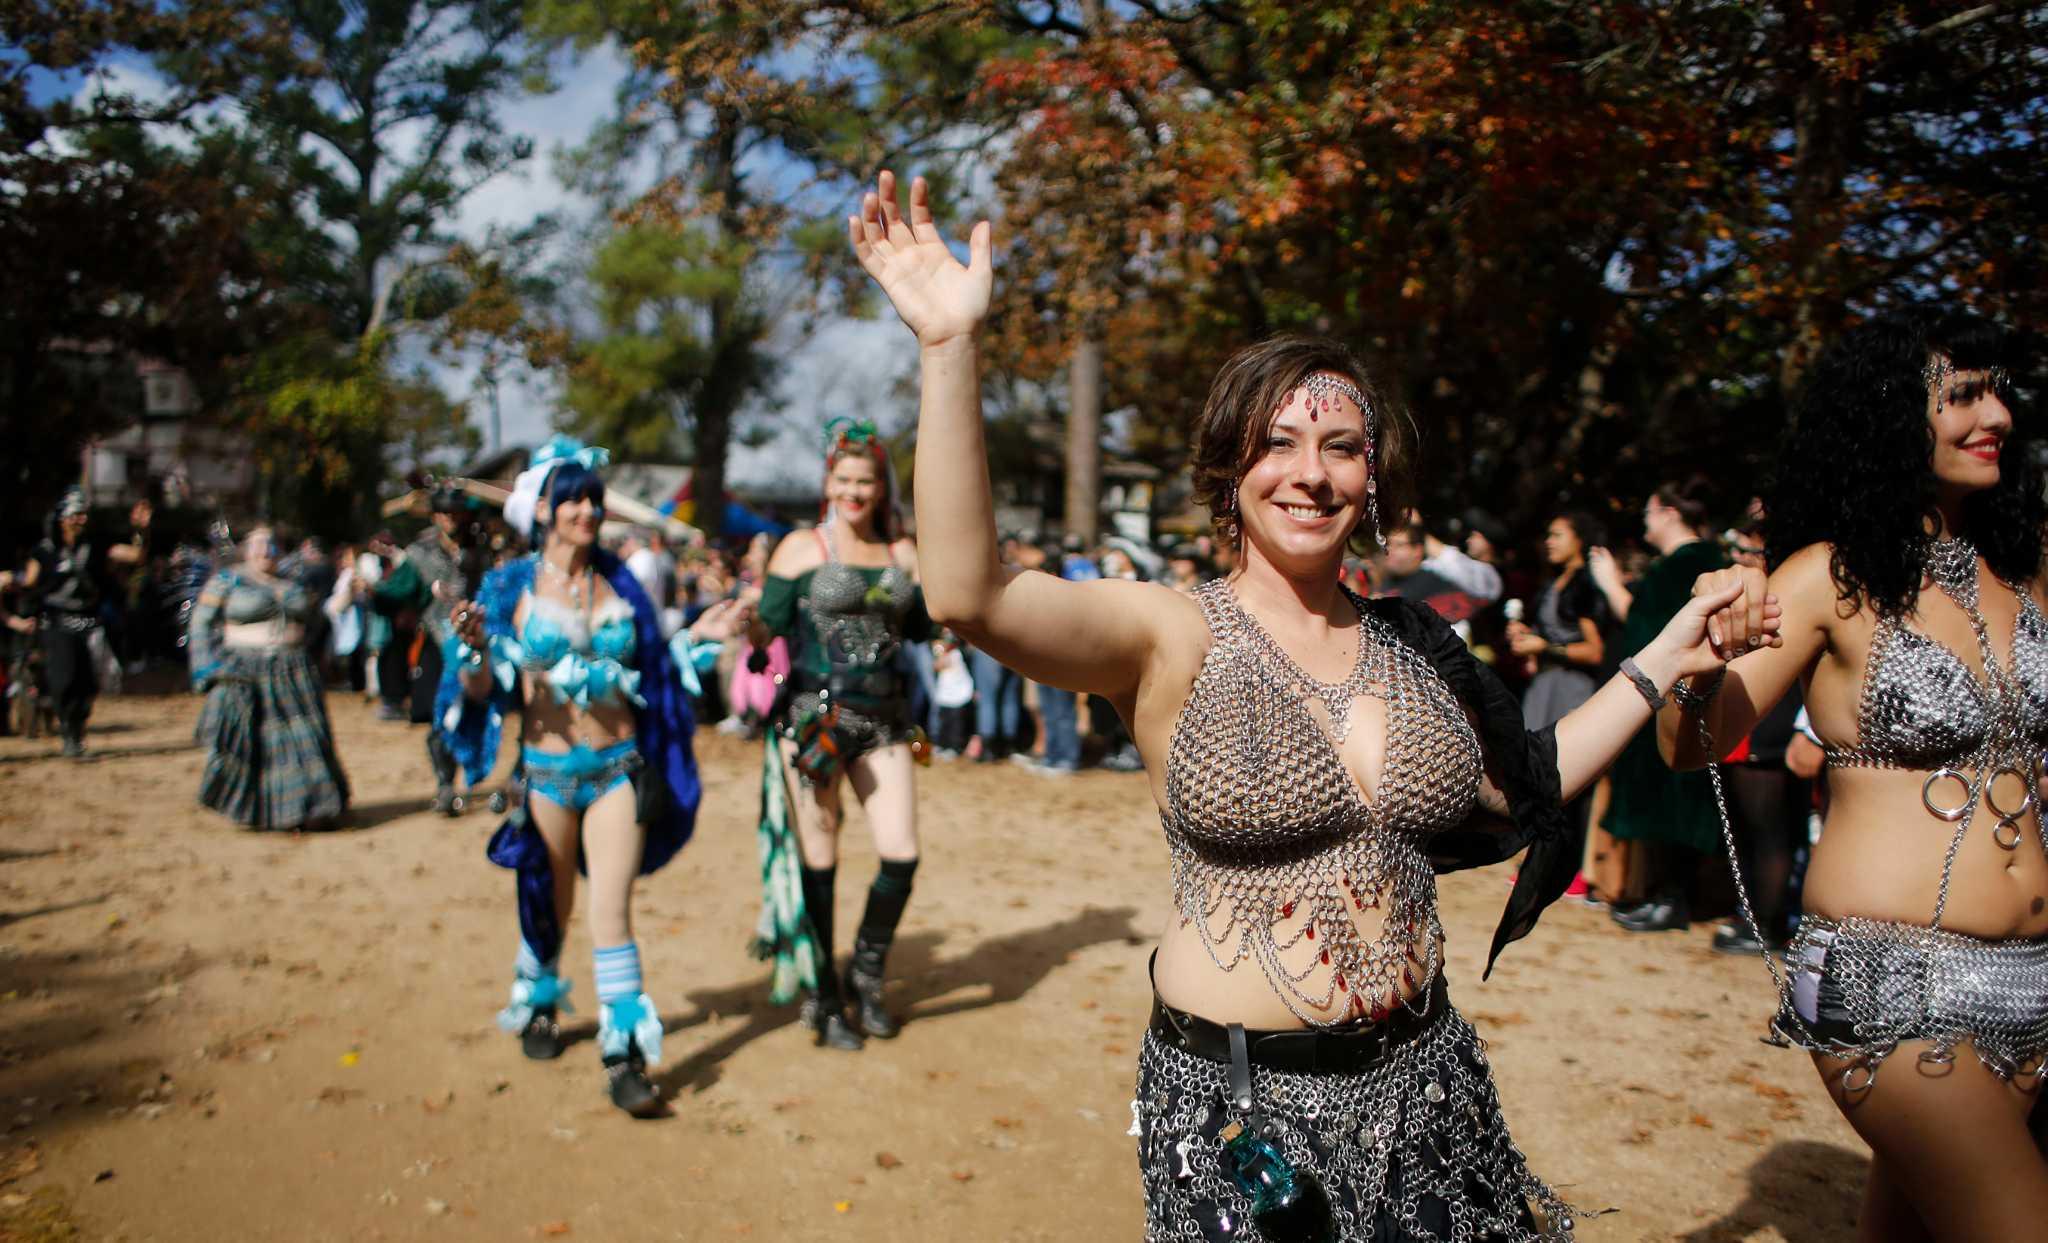 Texas Renaissance Festival Announces A Few New Additions